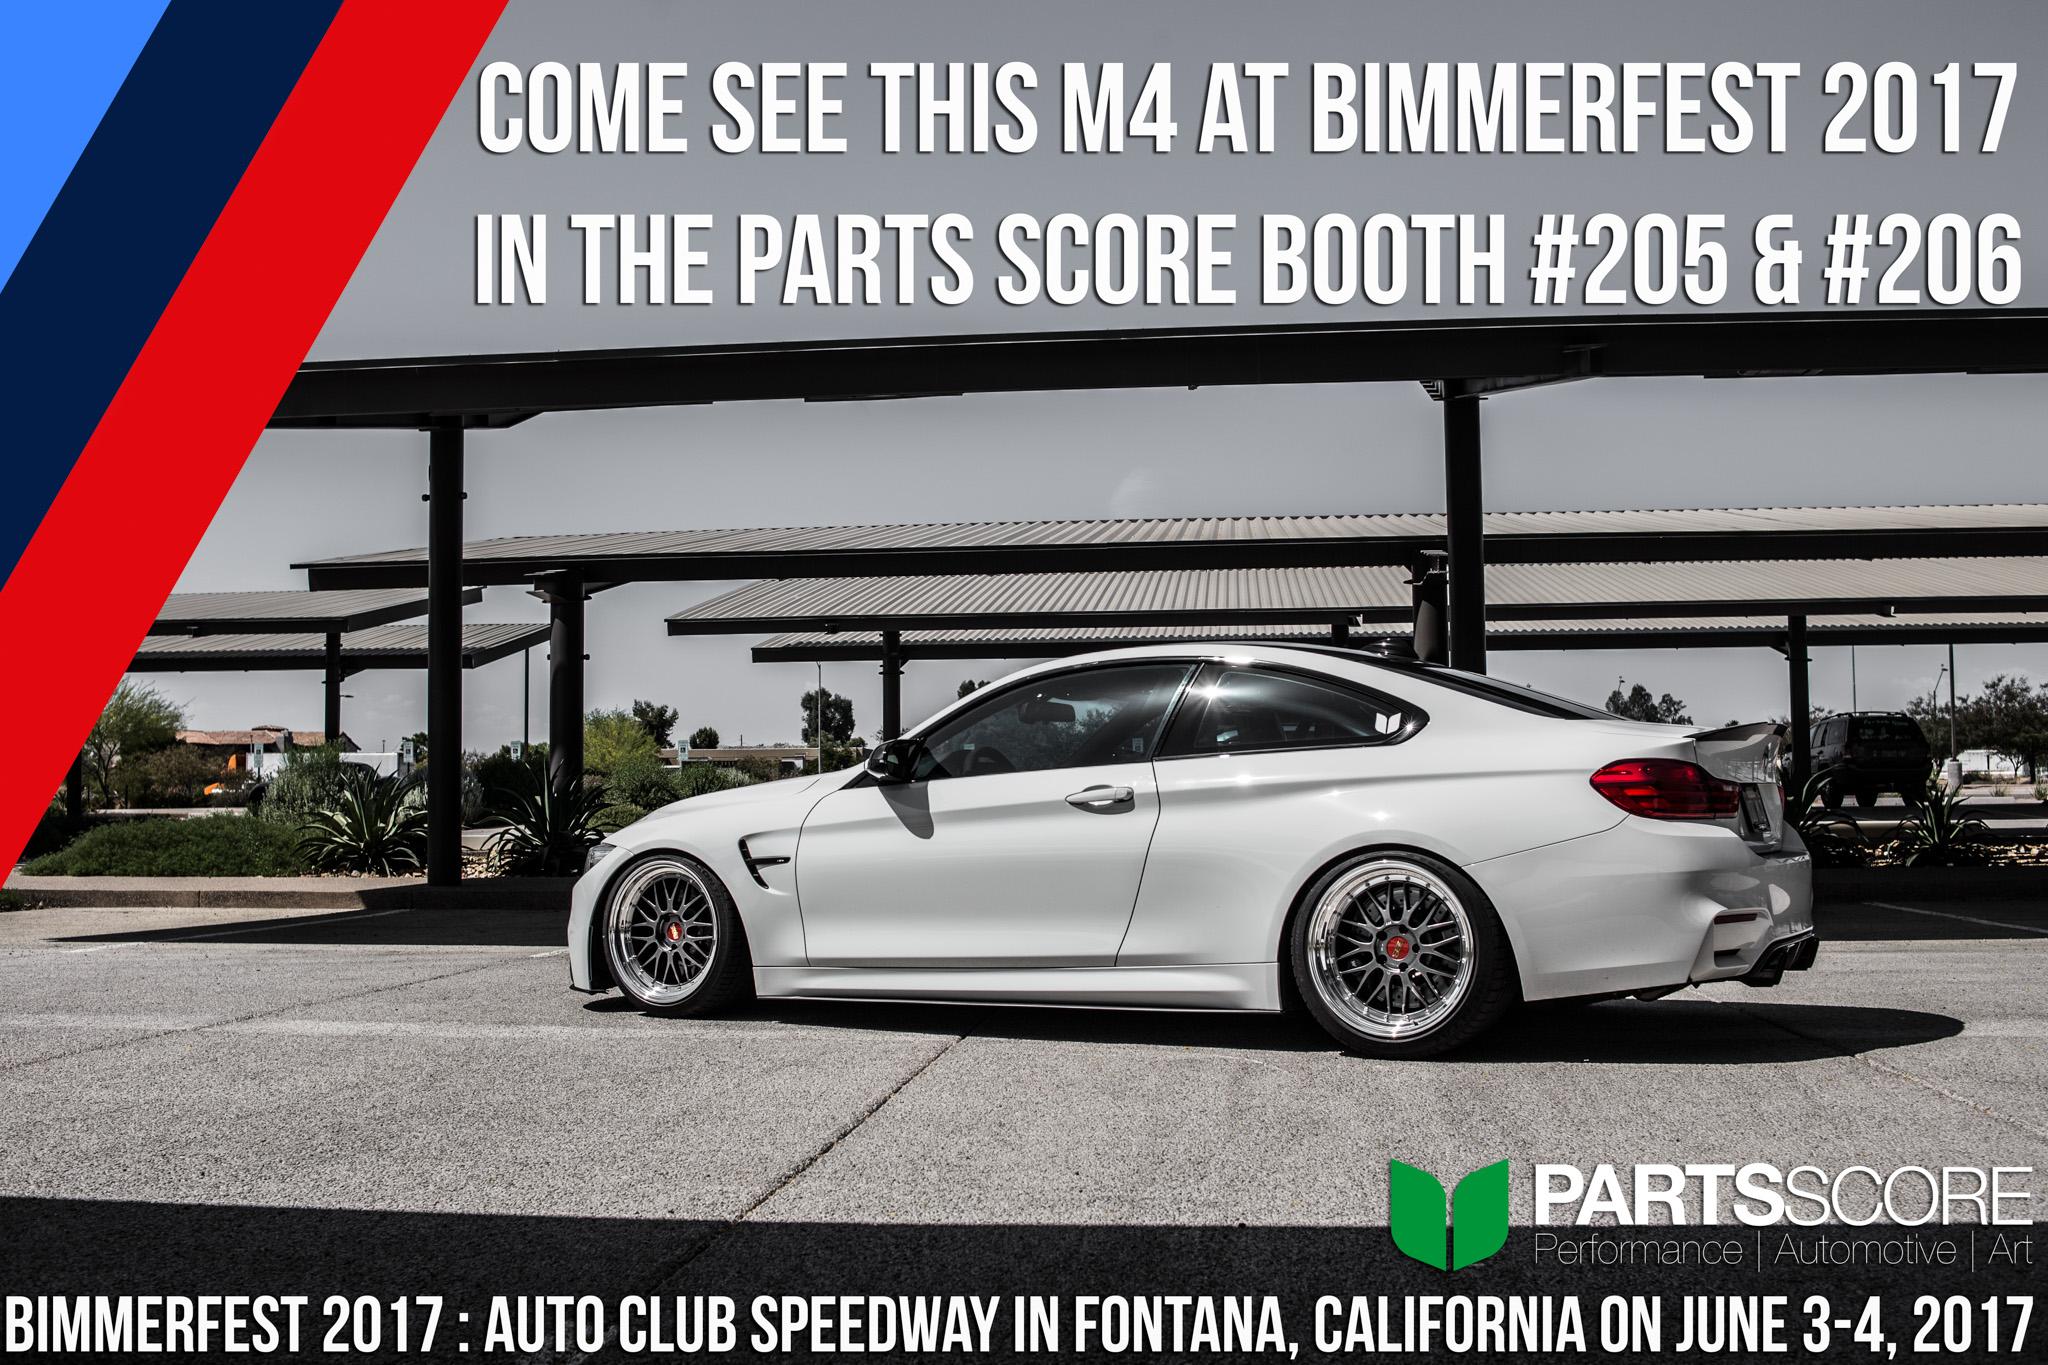 2017, bagged, bbs wheels, Bimmerfest, bimmerfest 2017, bimmerfest17 #bimmerfest 17, Bimmerfest2016, BMW, bmw classic, bmw fest, bmw north america, bmw show, bmwgram, bmwm, bmwm3, bmwm4, bmwm5, bmwmotorsport, bmwmpower, BMWNA, BMWNorthAmerica, bmwracing, bmwstance, california, car show, carshow, ESS, Esstuning, m1, m2, m3, m4, m5, mclarenf1, mpower, Next100, partsscore, racecar, show, slammed, stance, Supercharged, toyo, toyotires